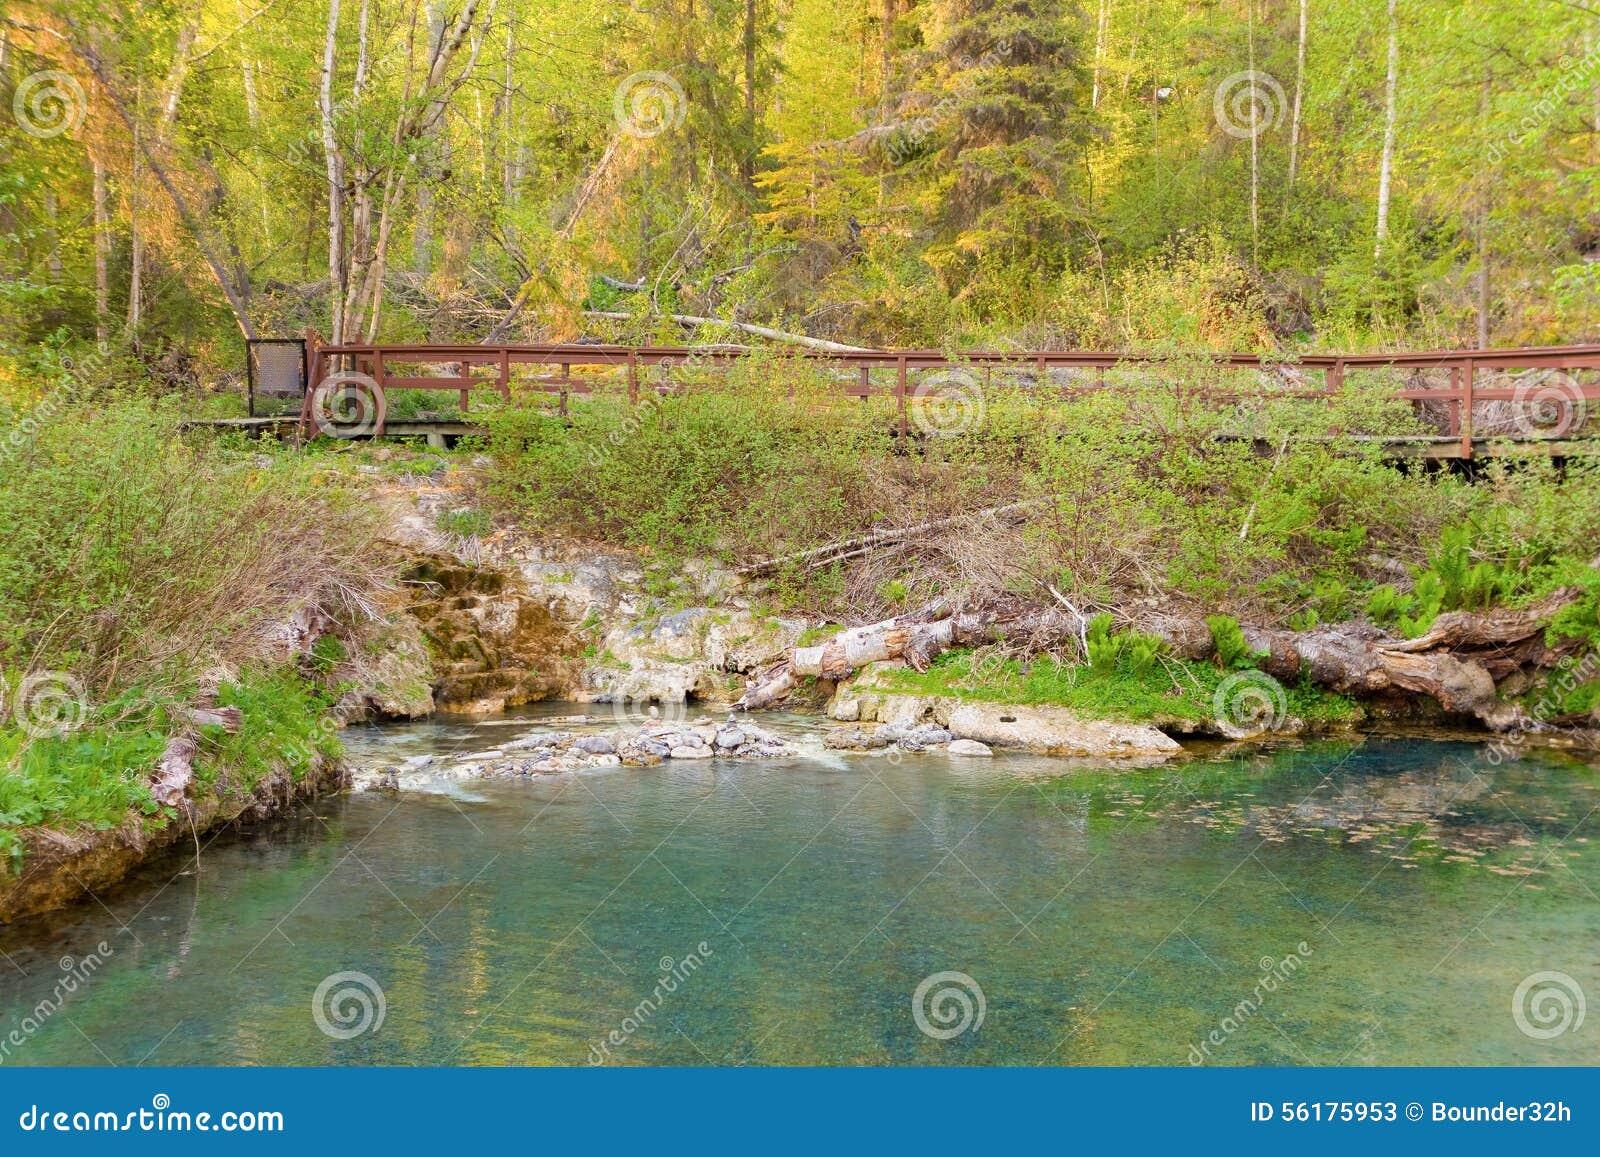 Natural Elements Images